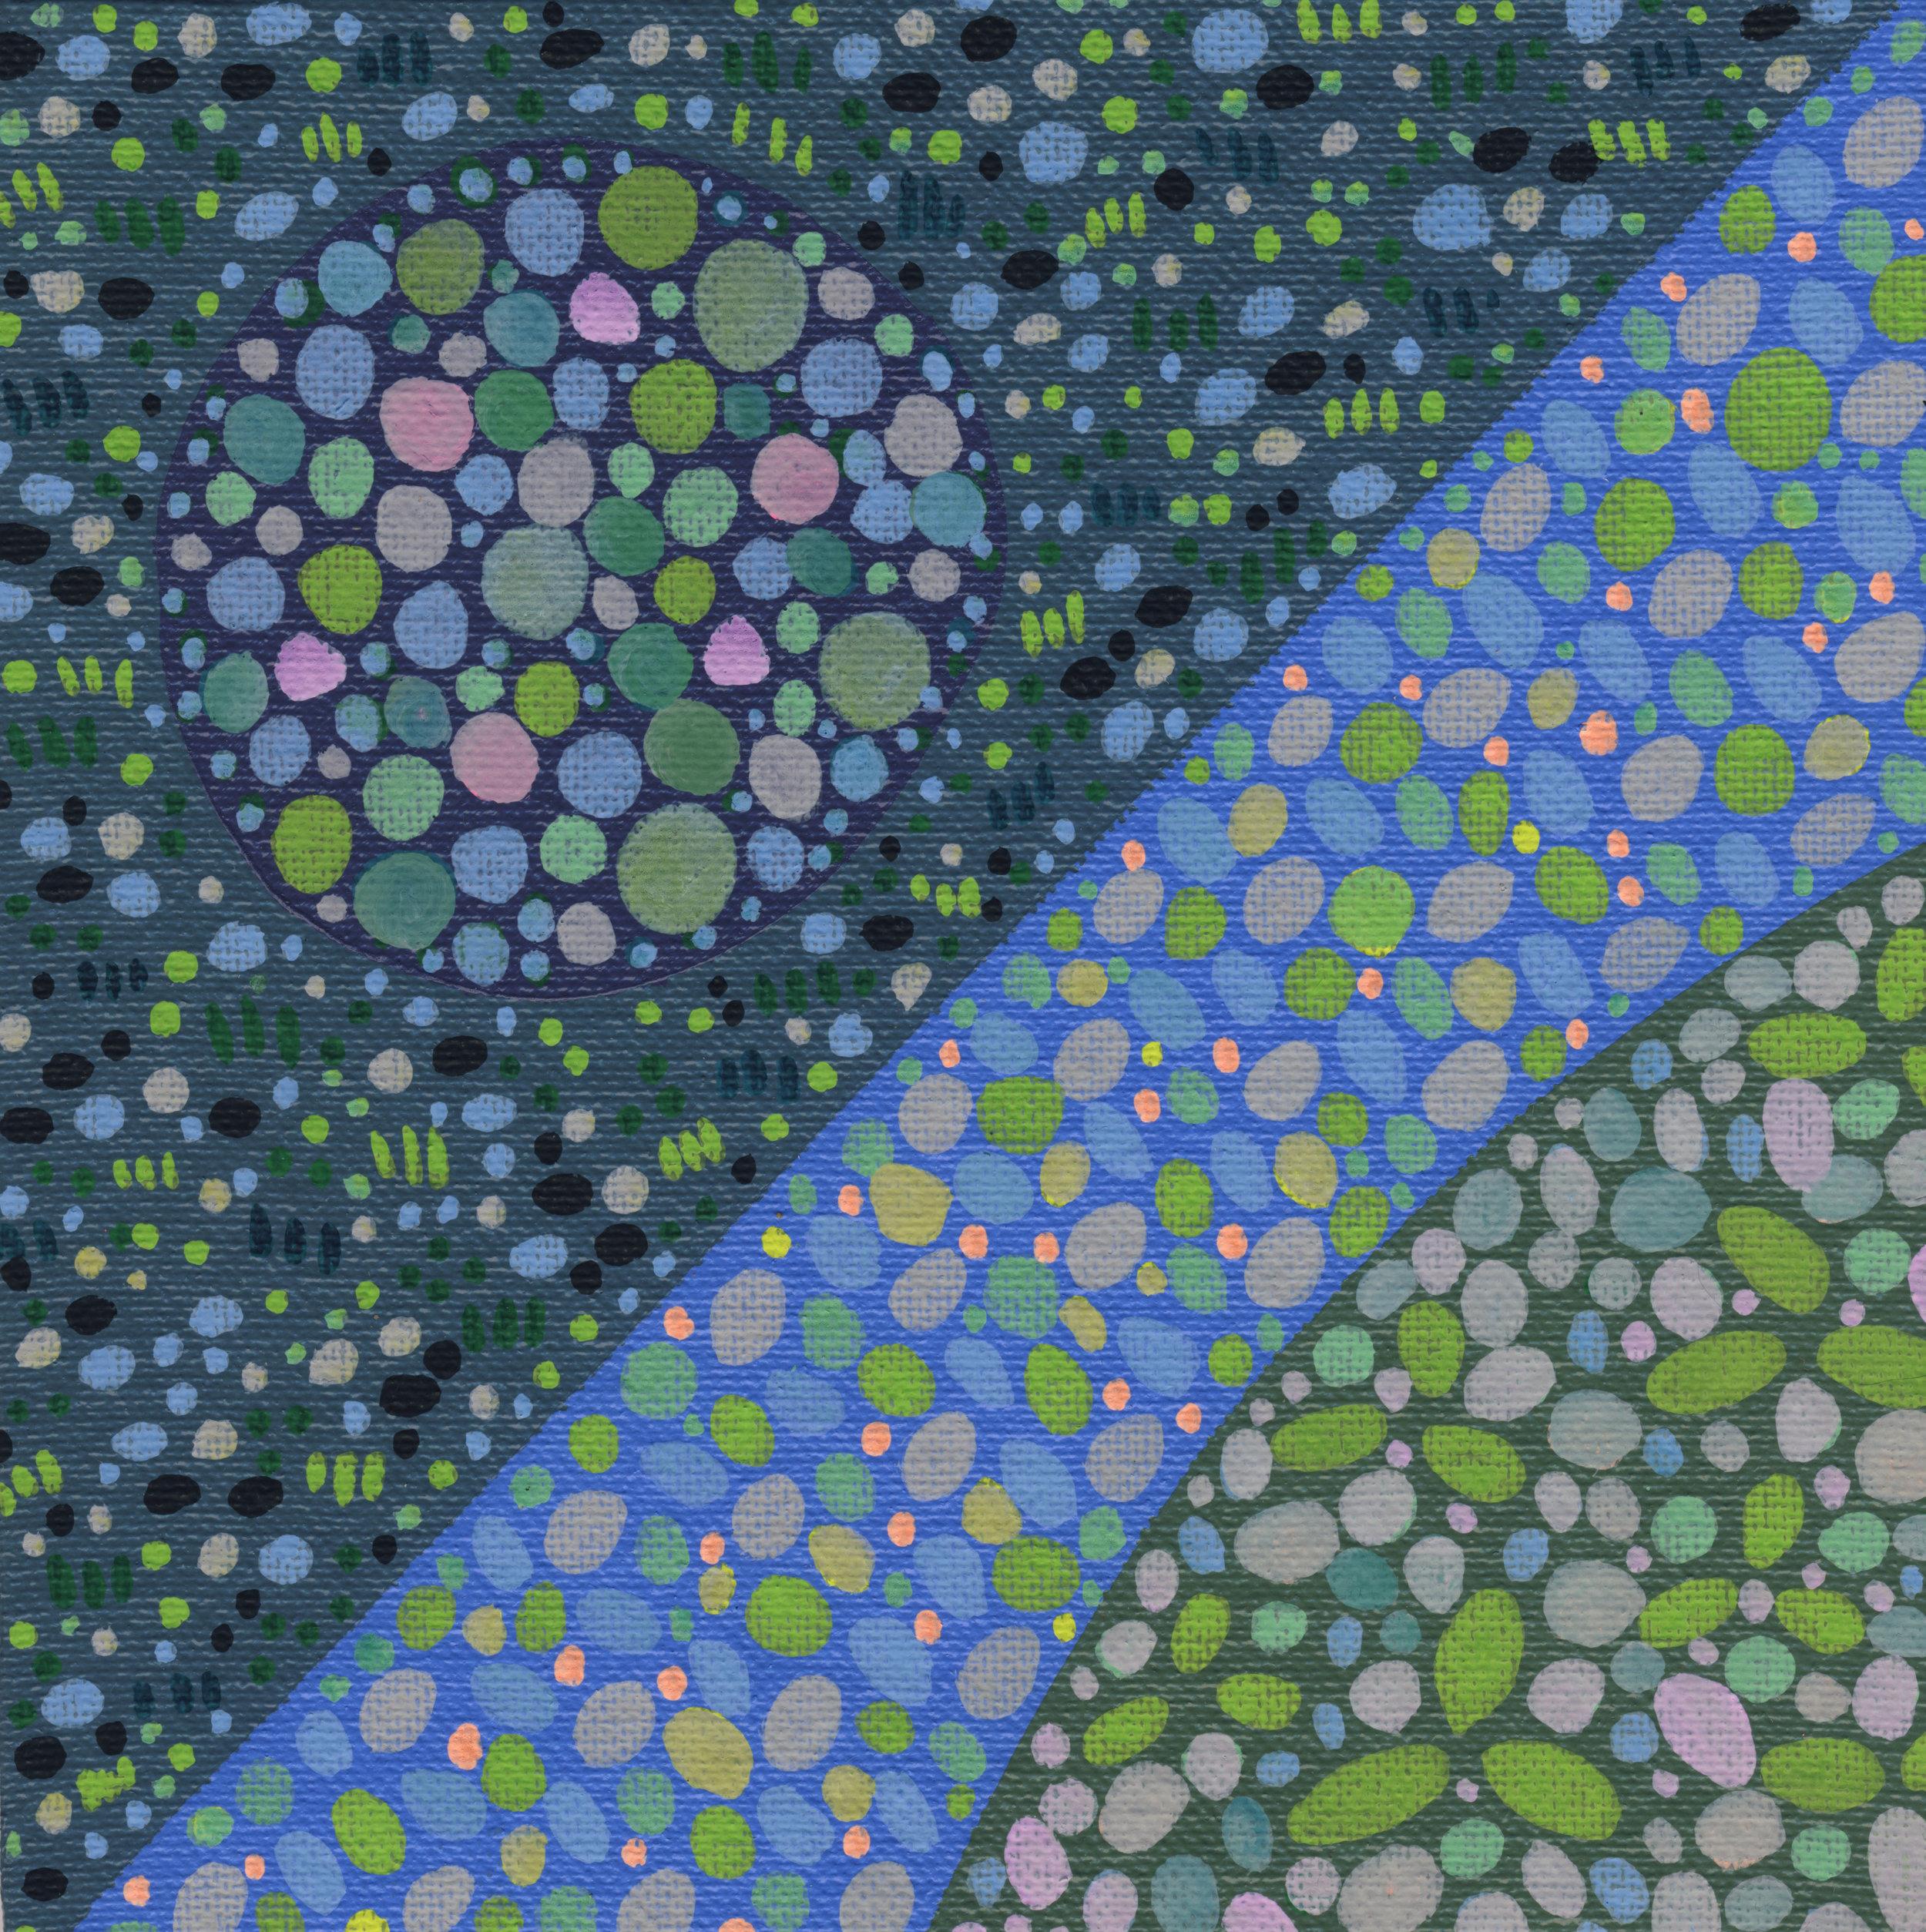 "59/100, Acrylic on canvas panel, 6"" X 6"", 3/6/19"